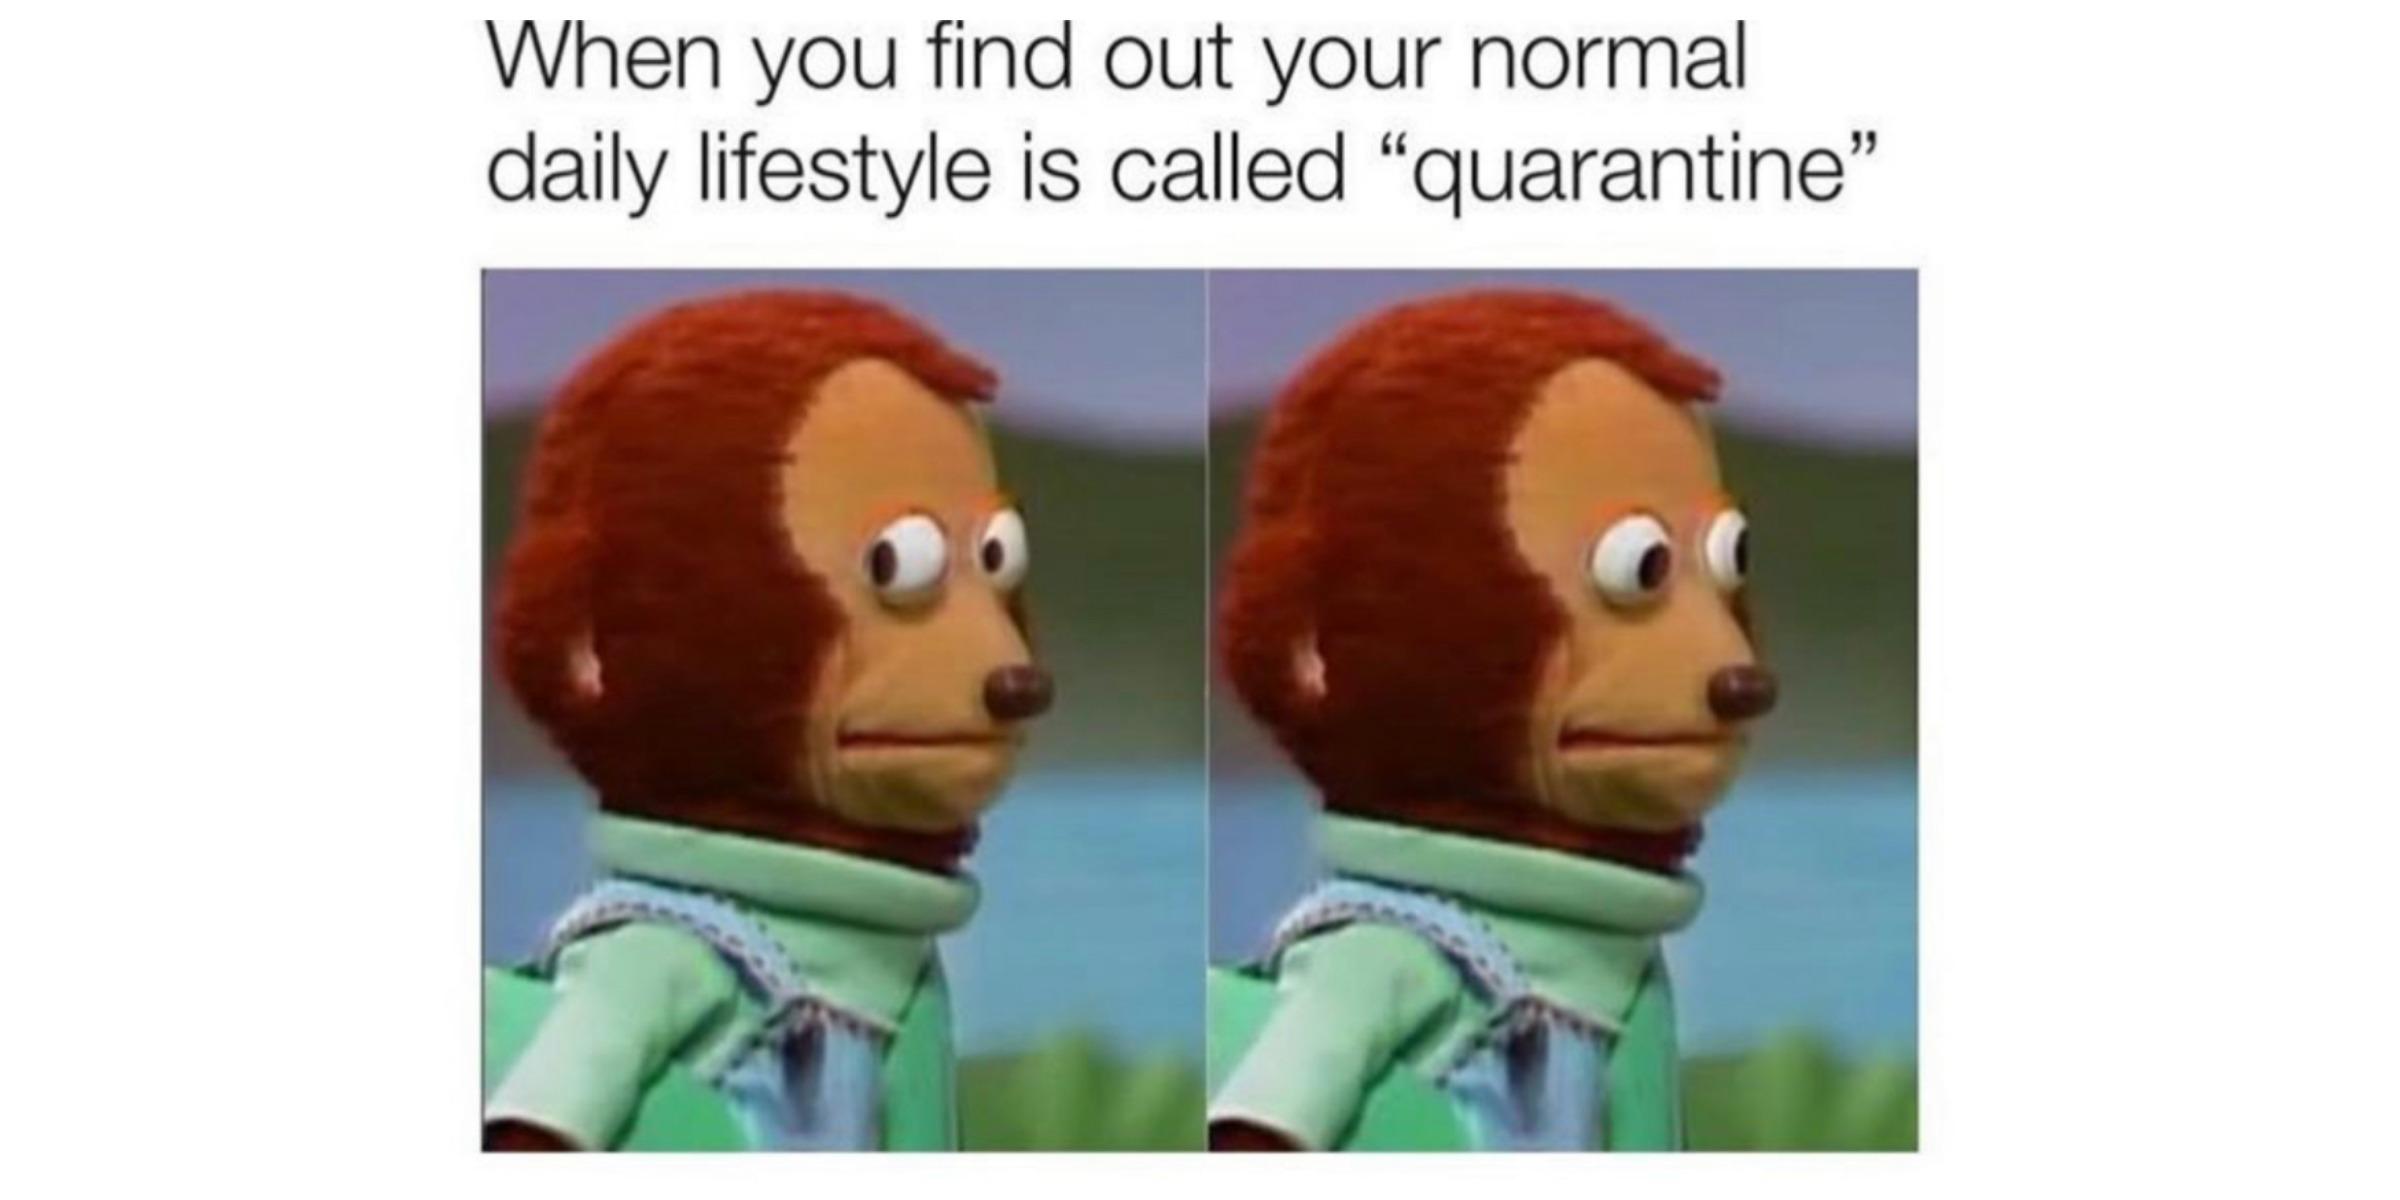 TGIB WEEKLY: Quarantine meme